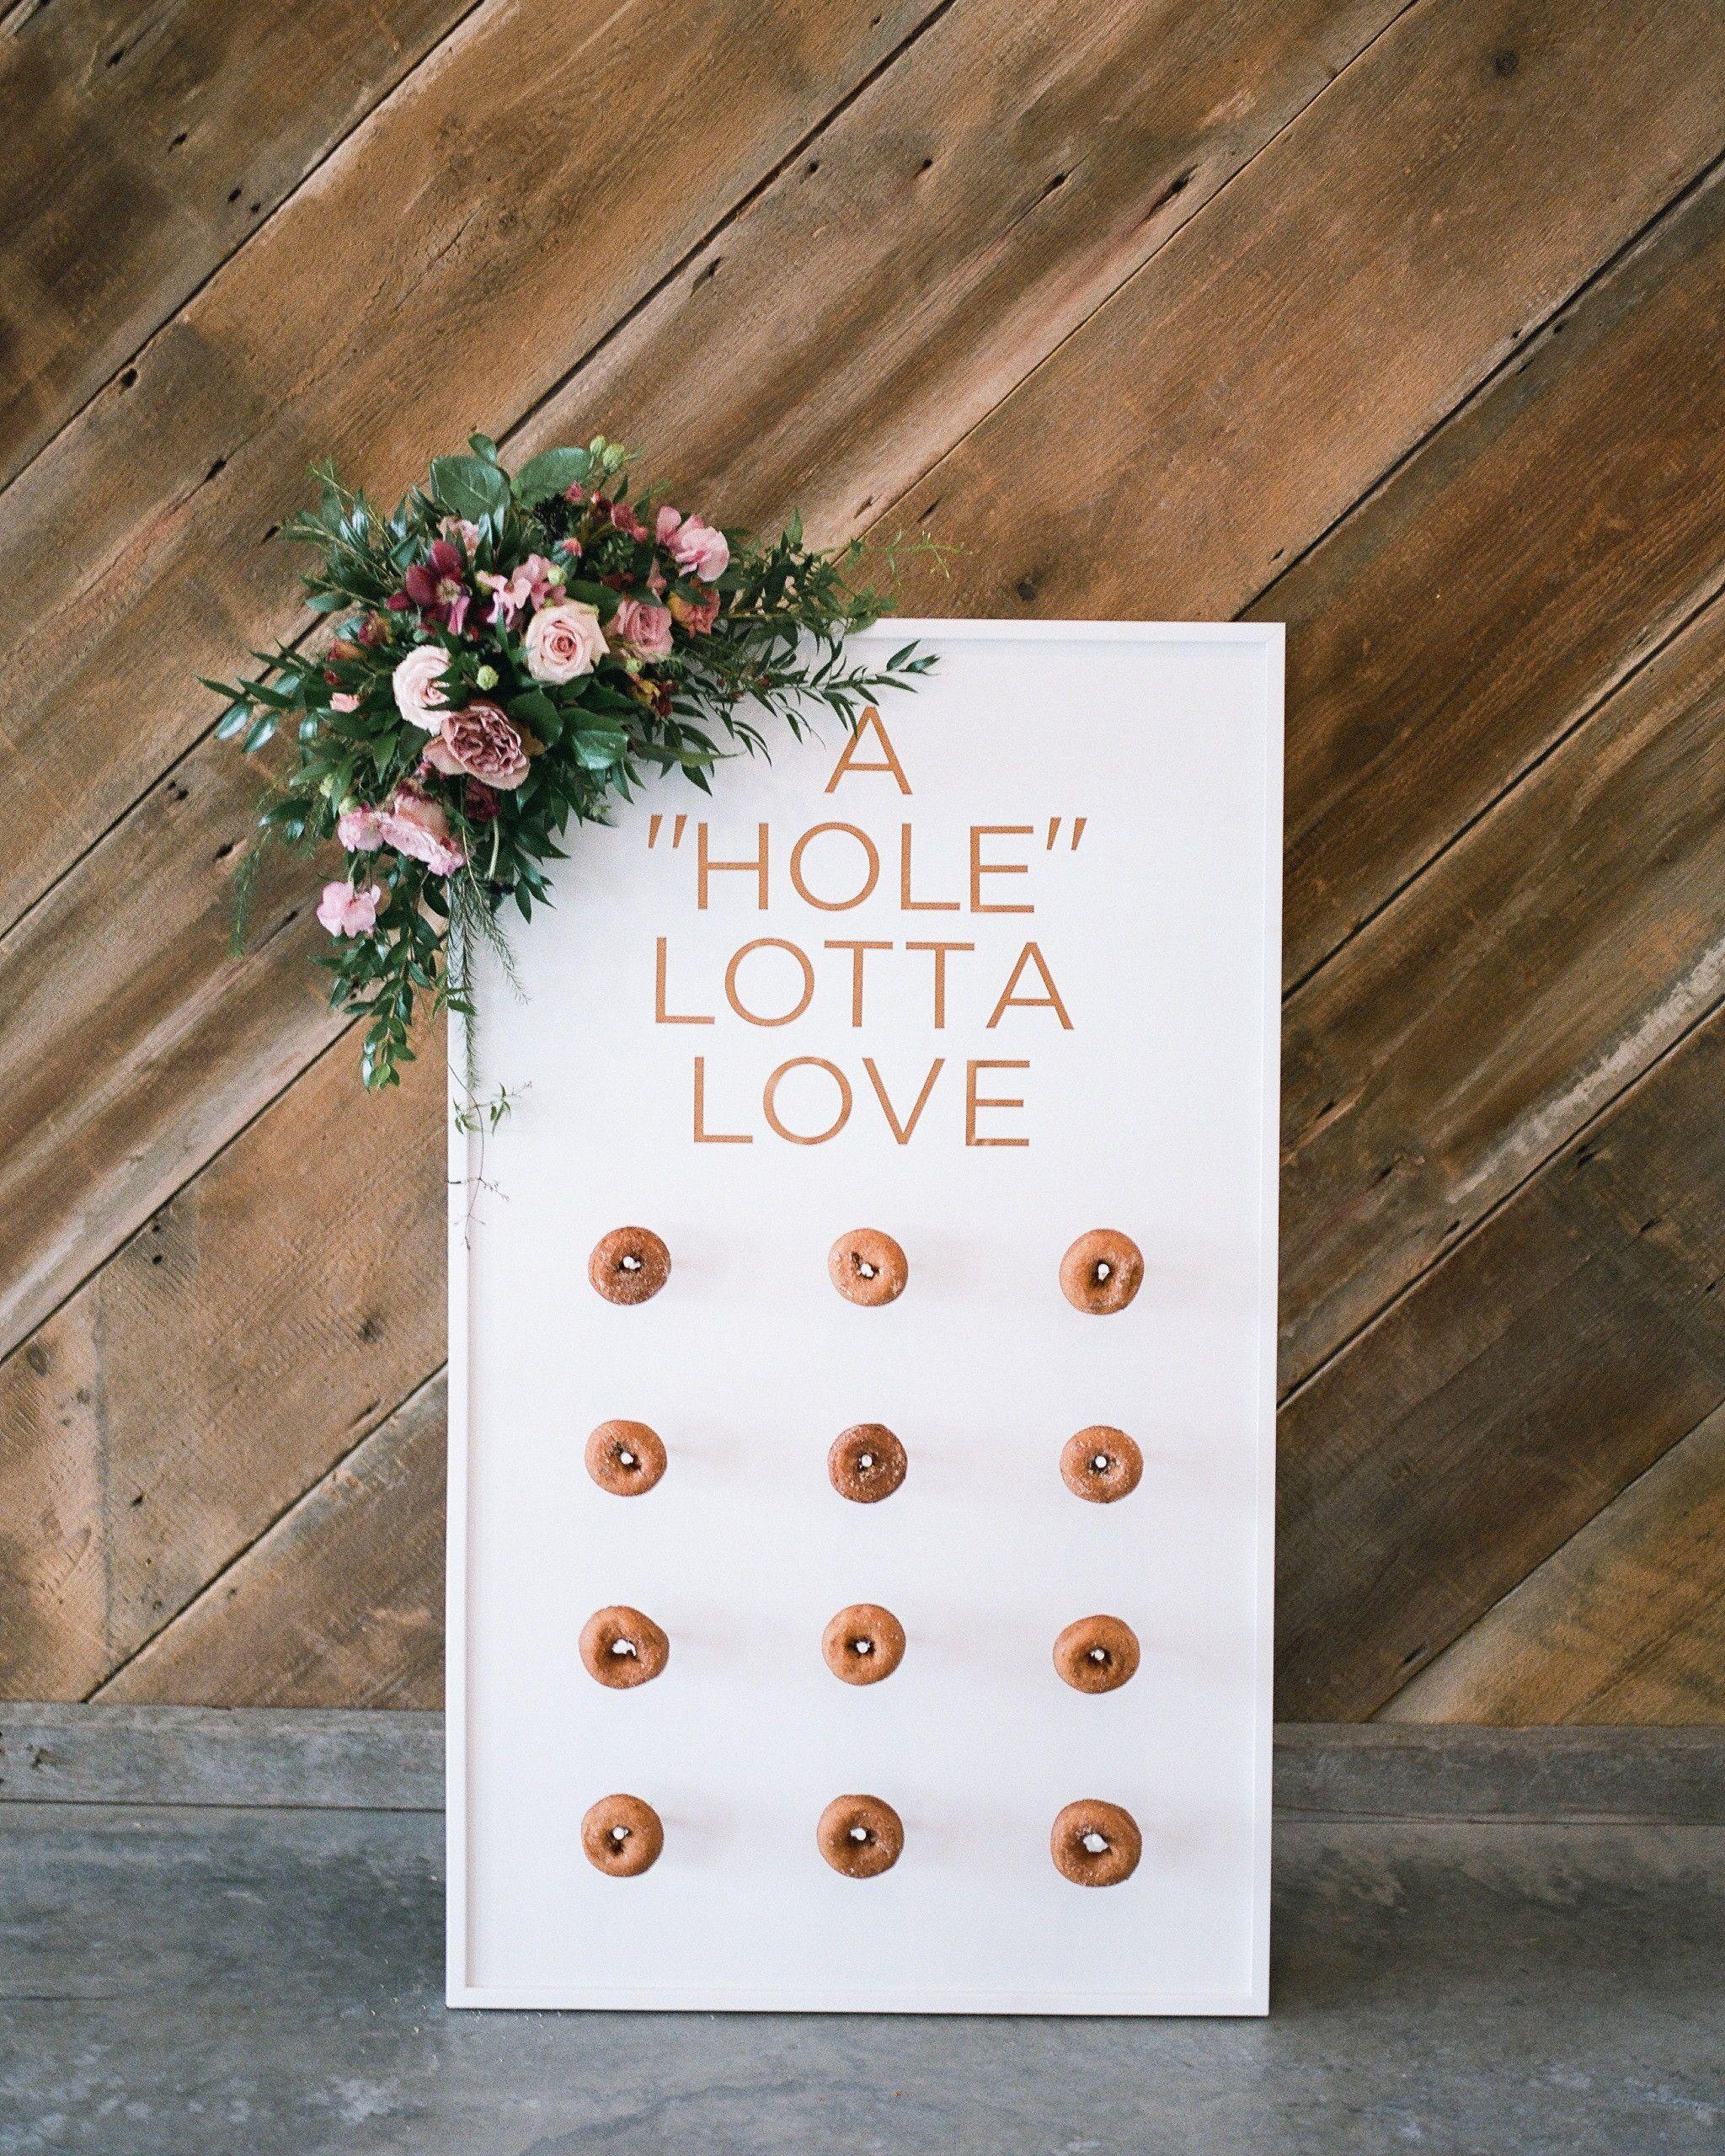 22 Unique Ideas for Your Fall Engagement Party #engagementparty